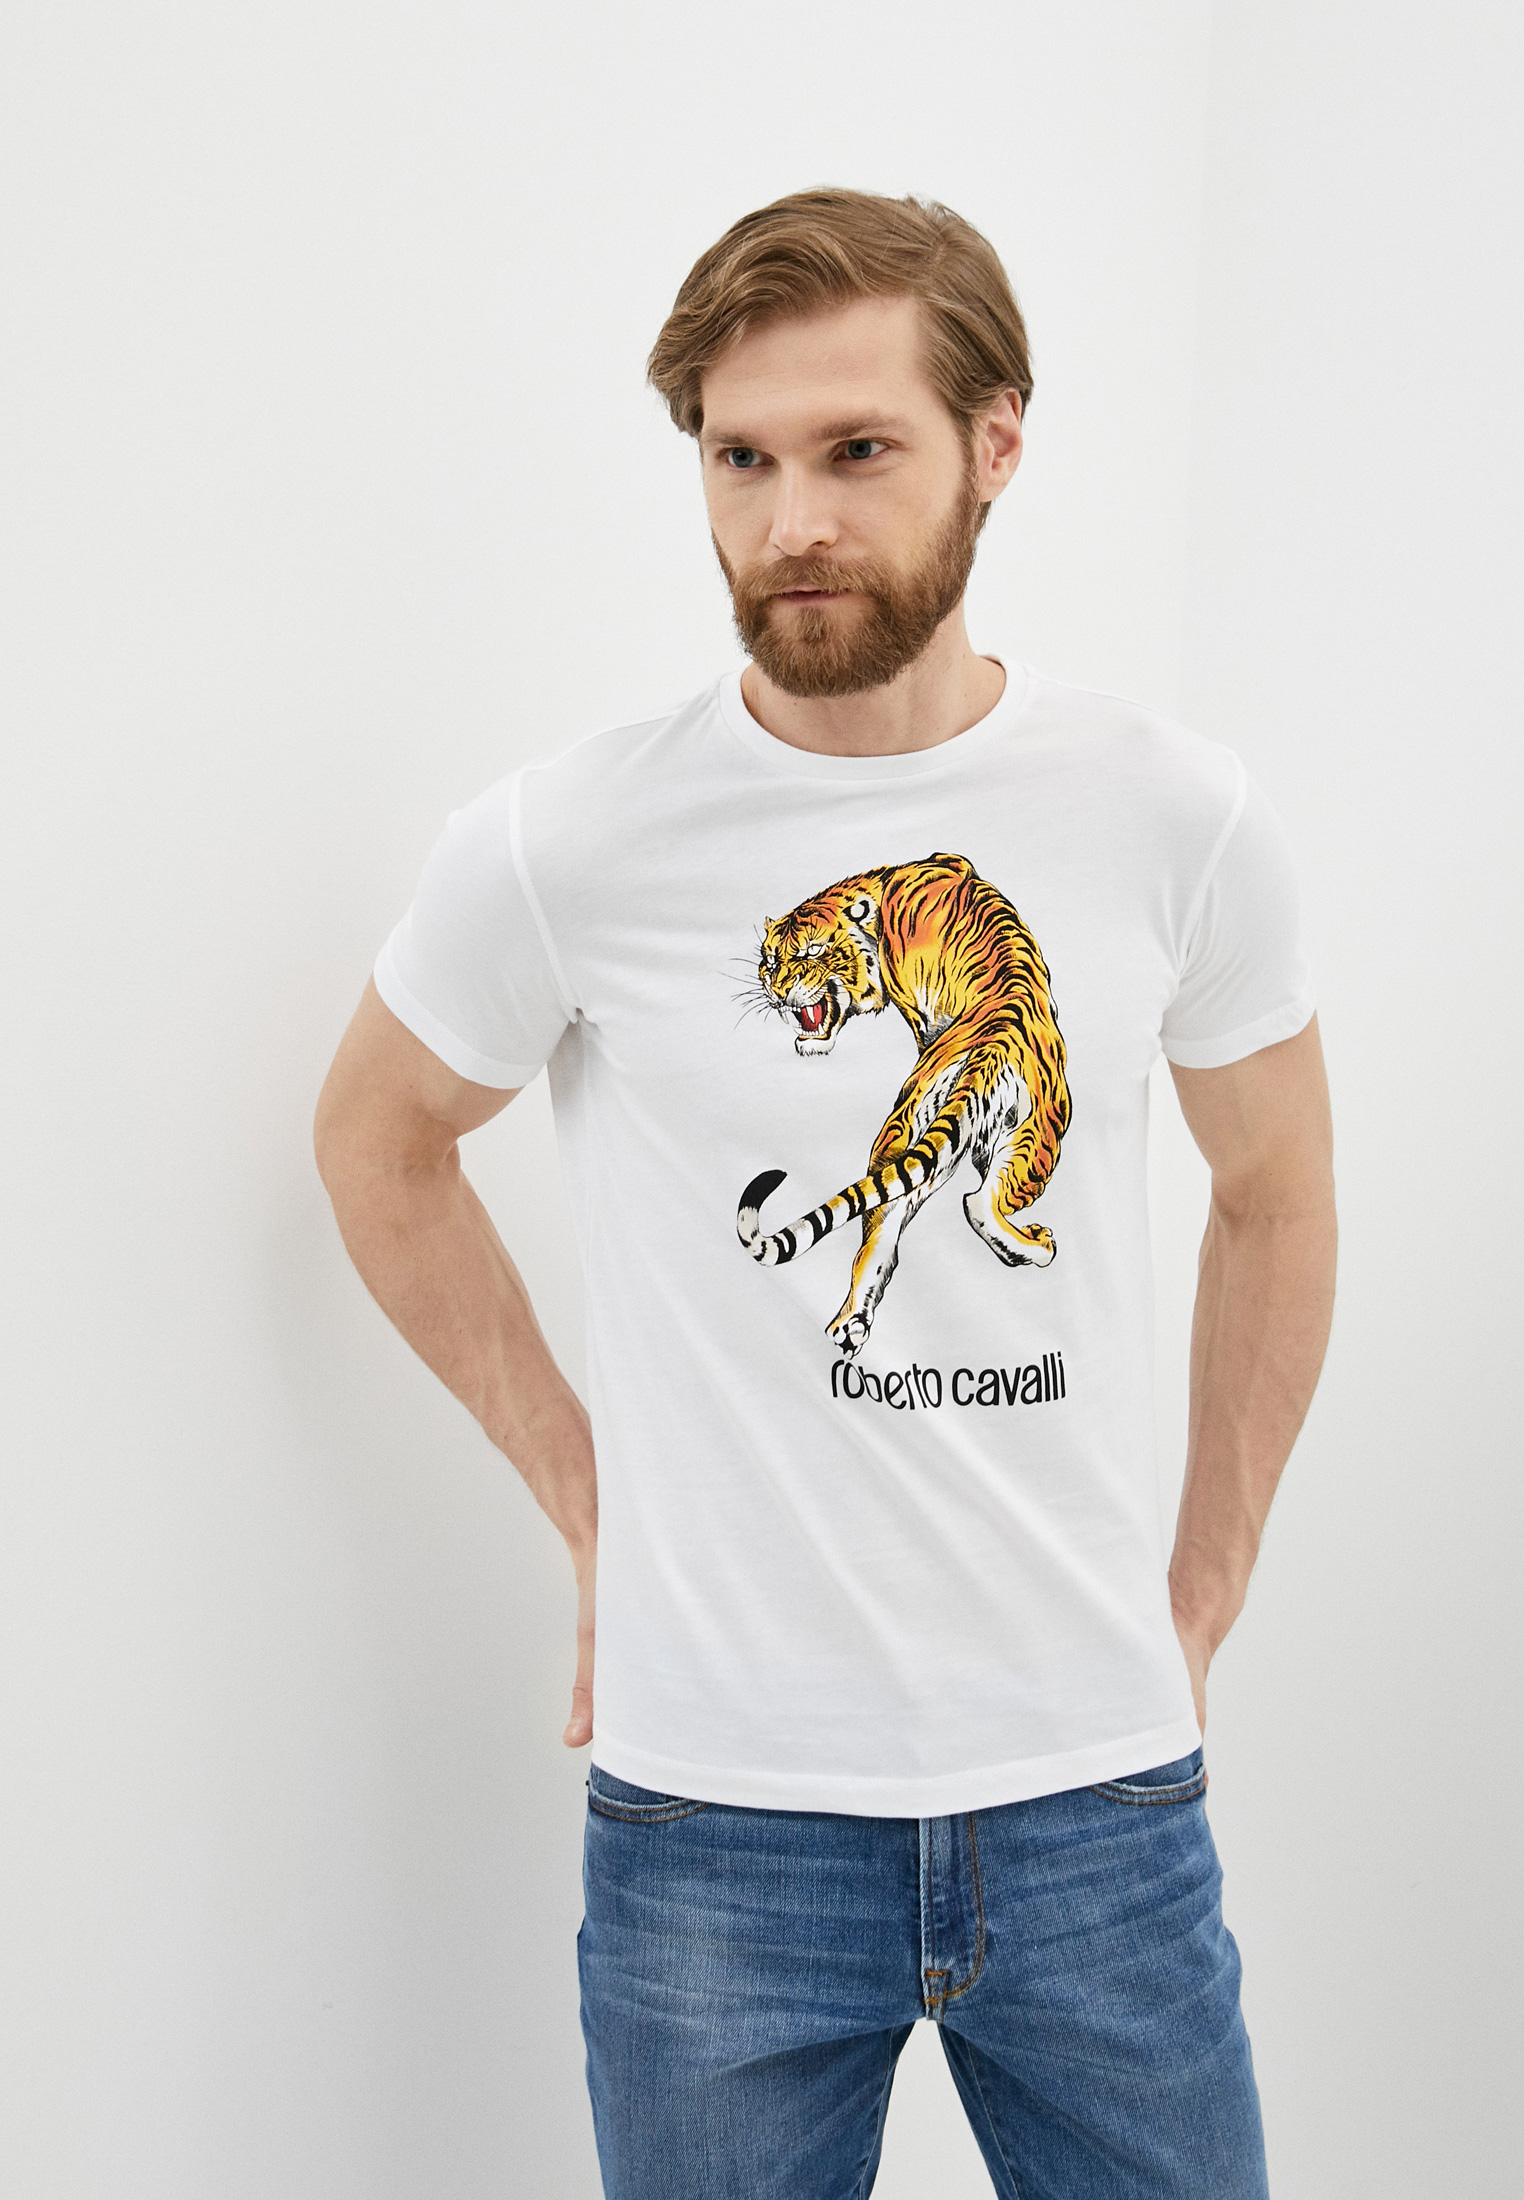 Мужская футболка Roberto Cavalli (Роберто Кавалли) HST61DA0270